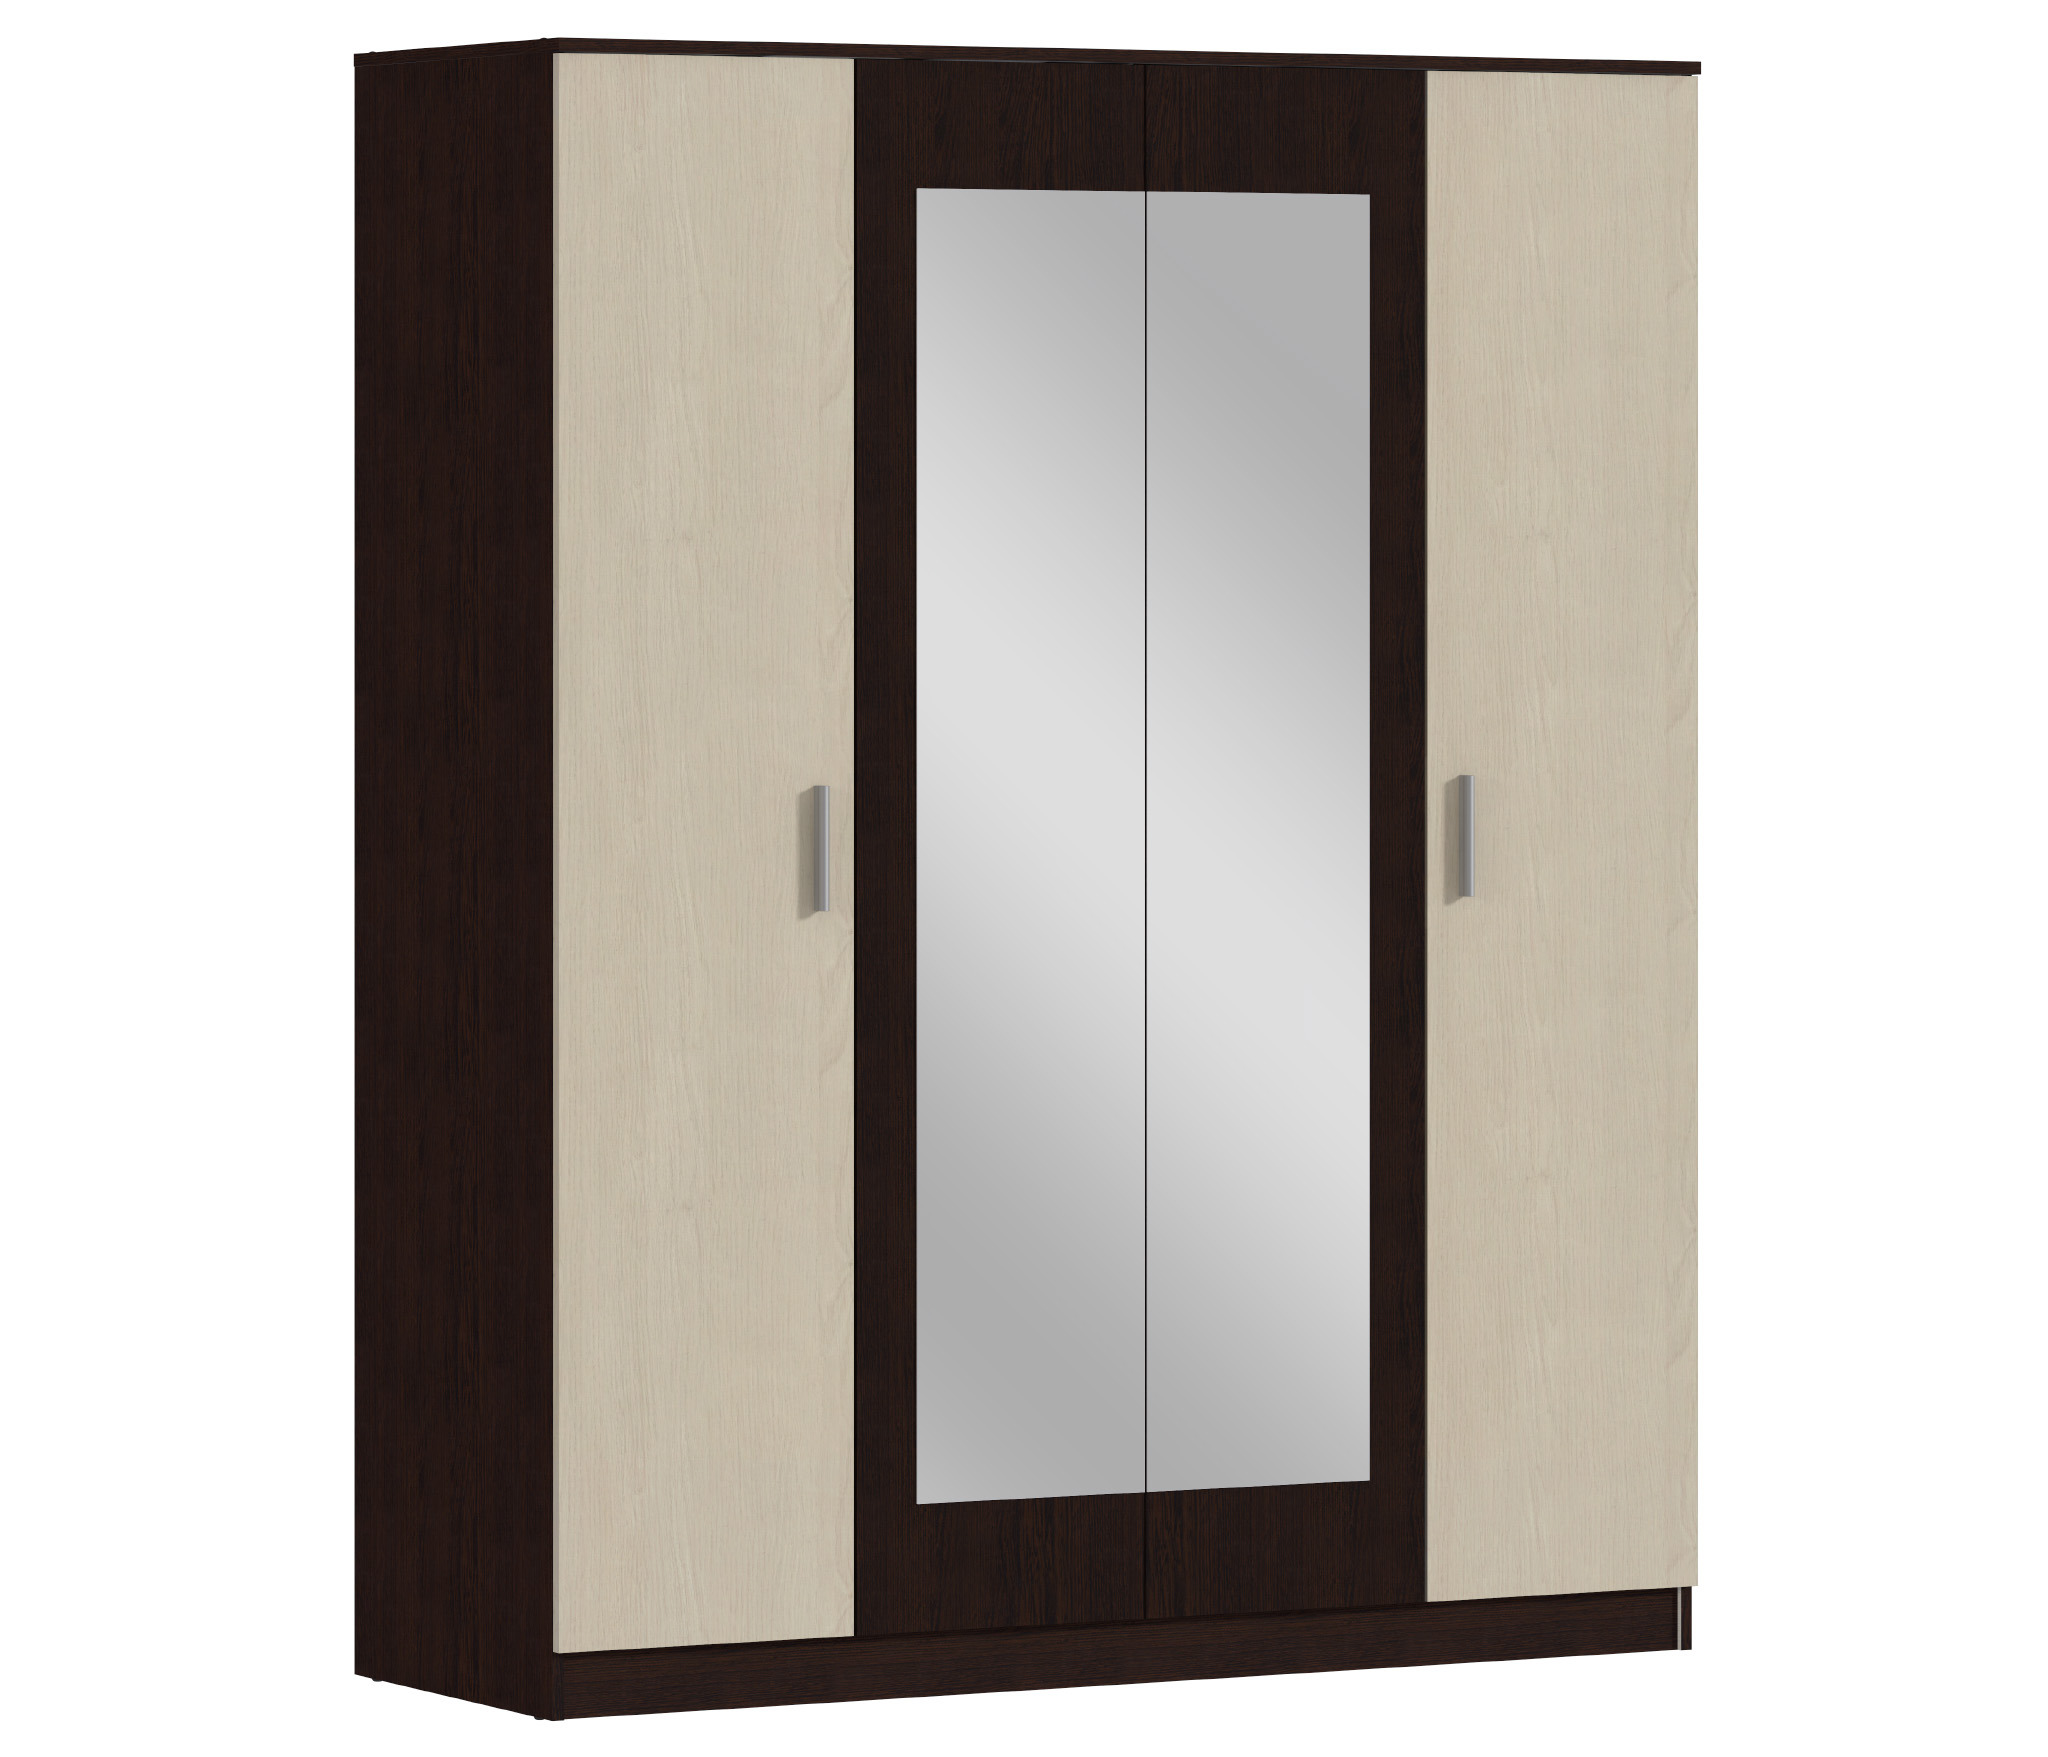 Уют СБ-2750 Шкаф 4-х дверныйГостиная<br><br><br>Длина мм: 1600<br>Высота мм: 2000<br>Глубина мм: 577